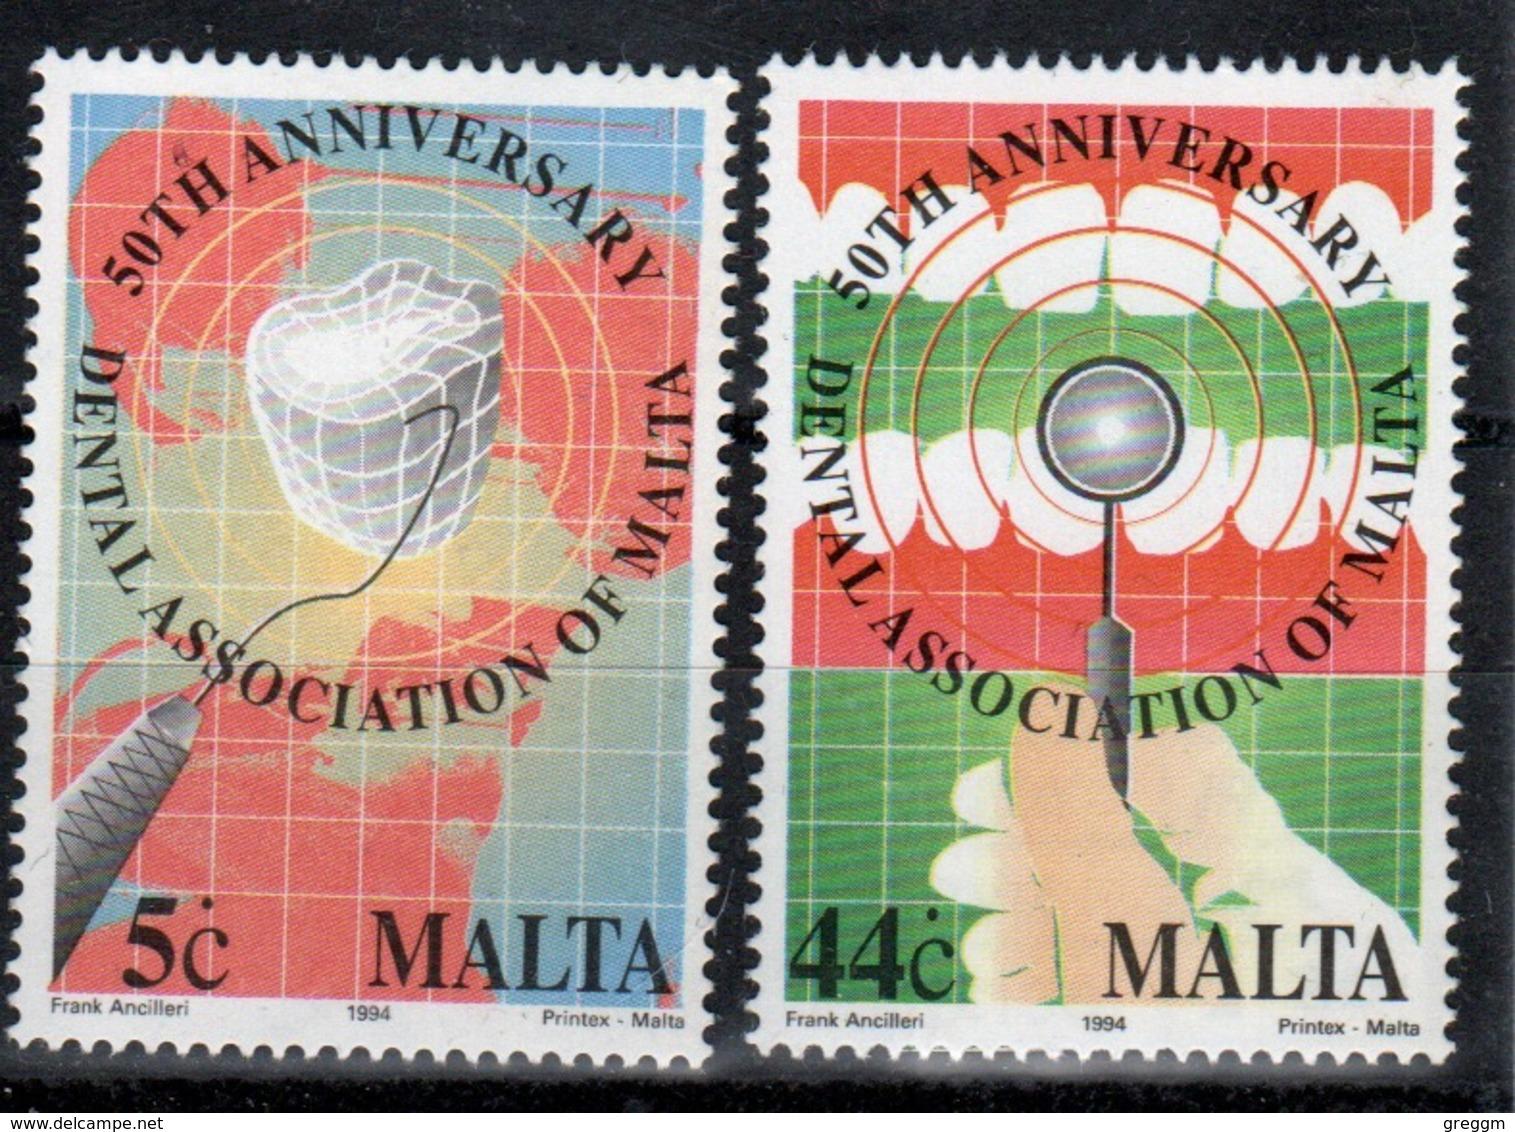 Malta 1991 Set Of Stamps To Celebrate 50th Anniversary Of Maltese Dental Association. - Malta